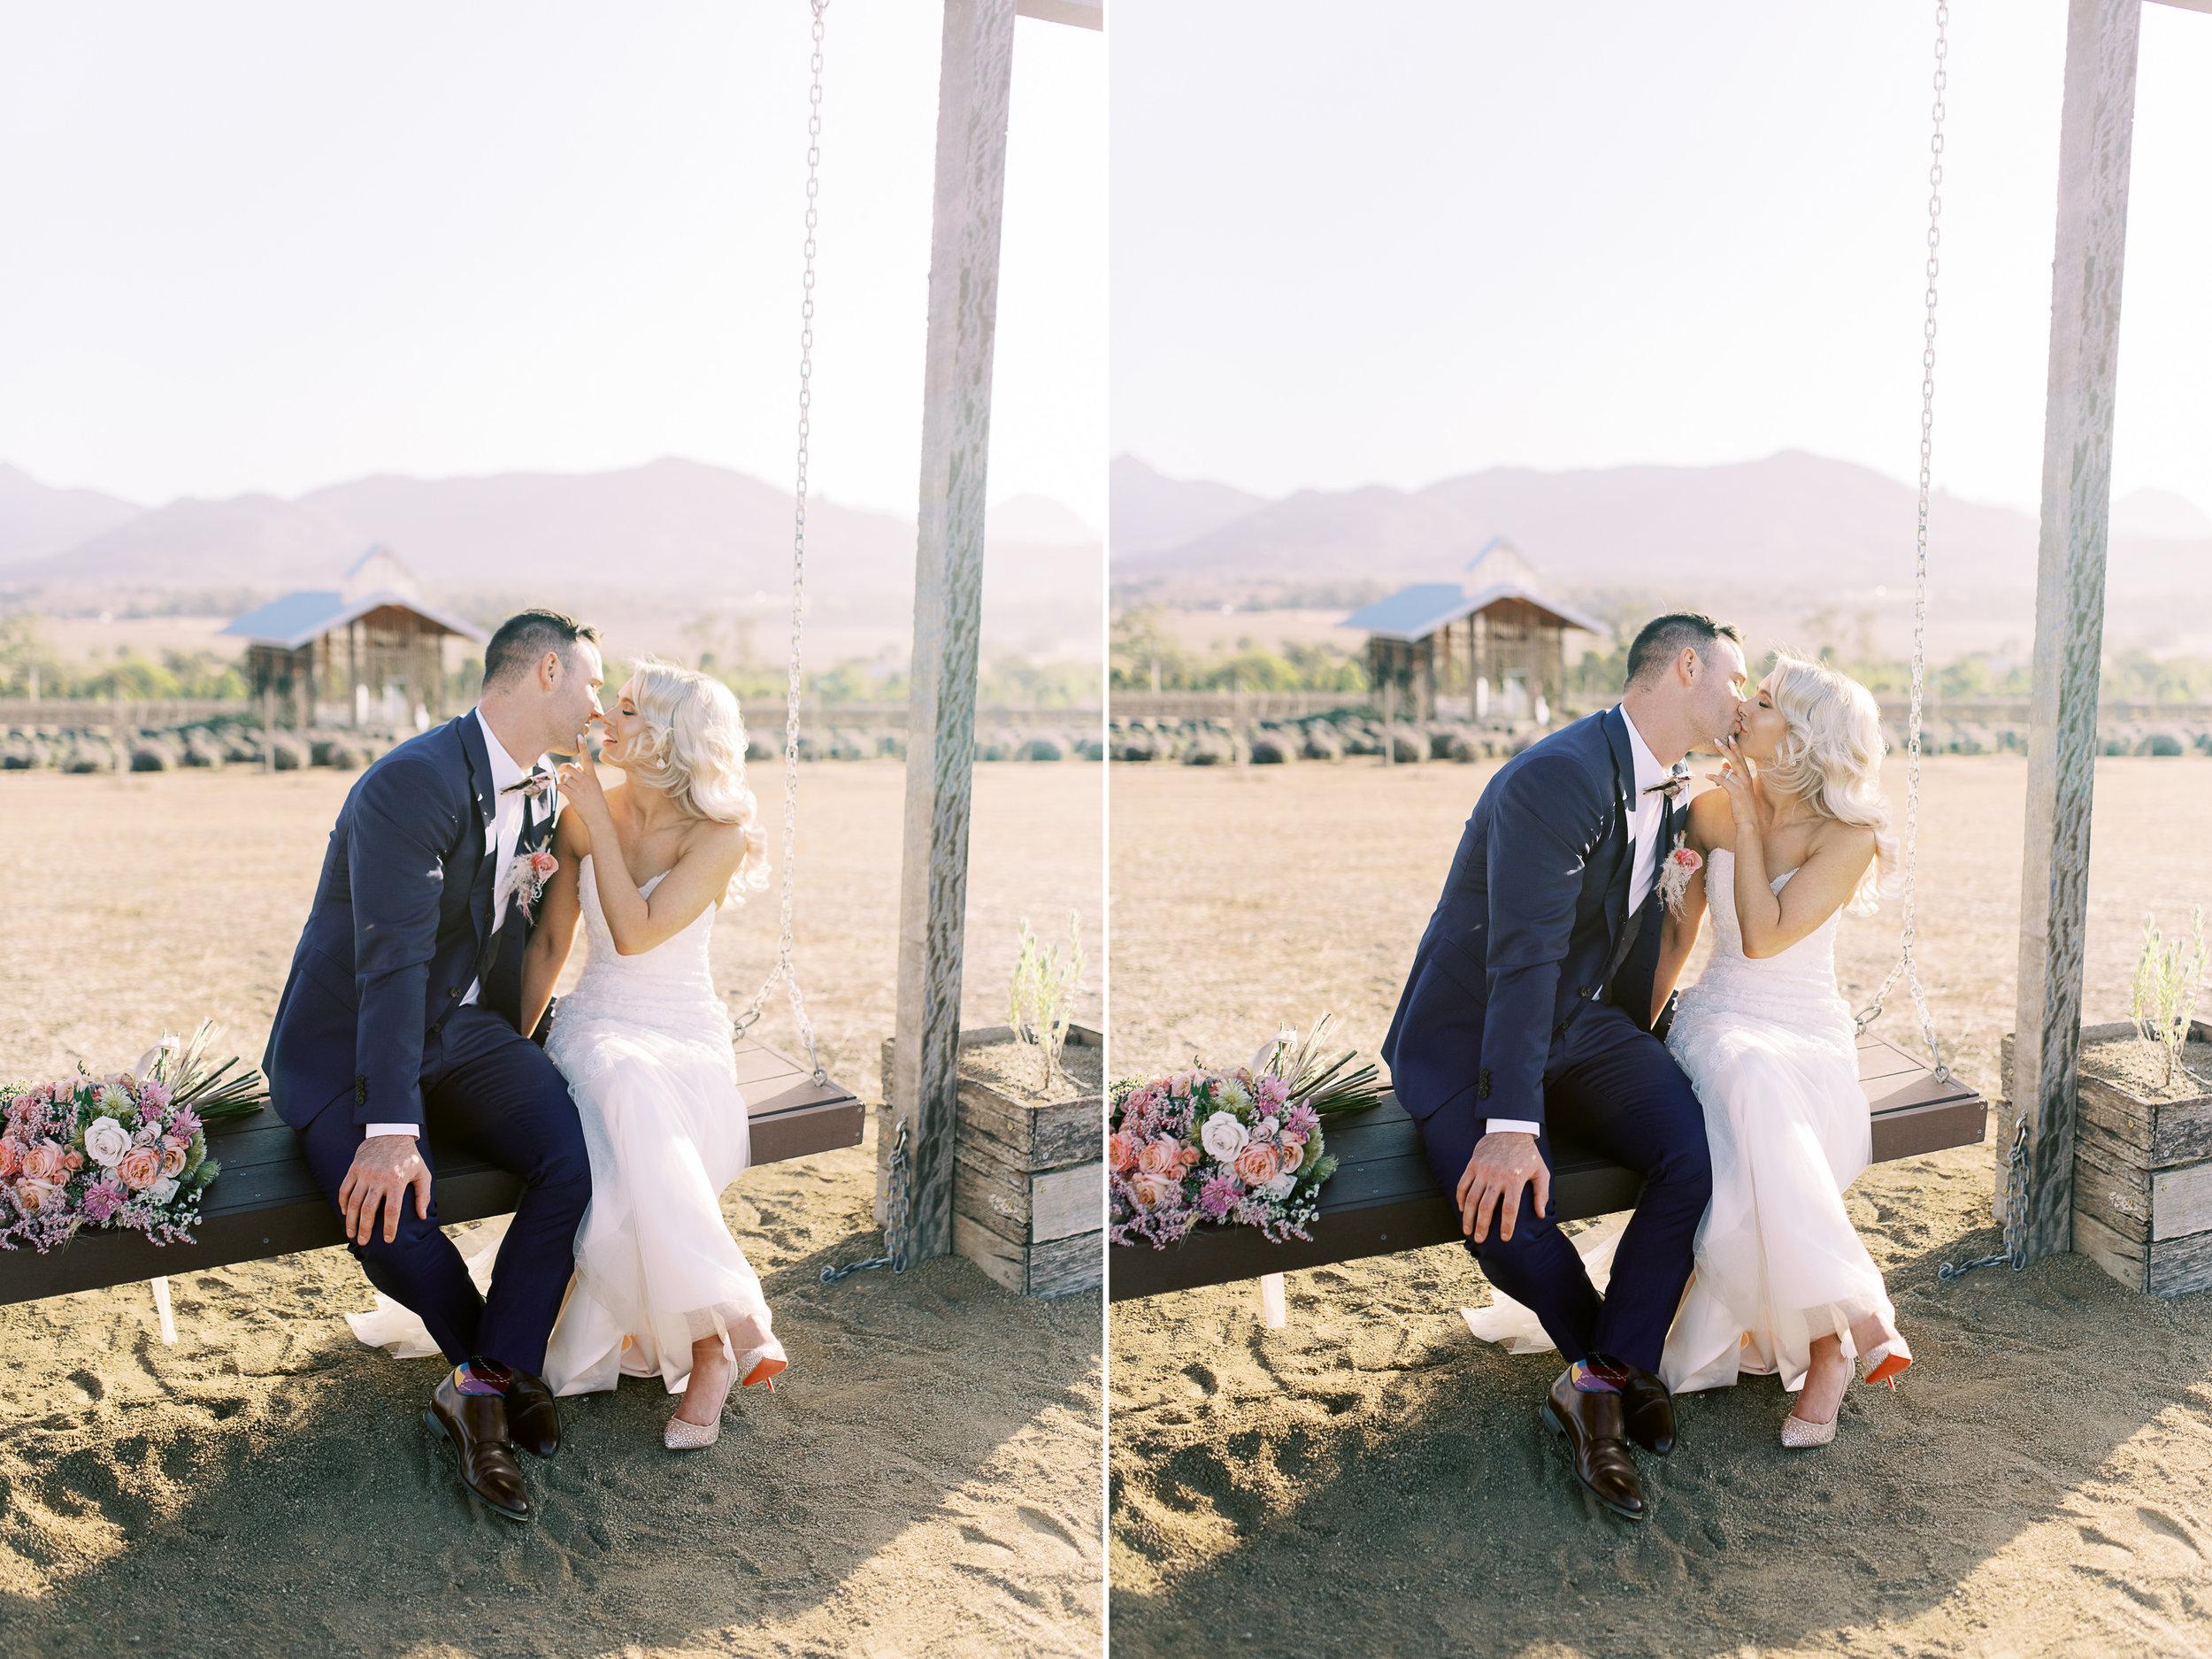 kooroomba-lavendar-farm-film-photography-wedding-photography-romantic-19.jpg